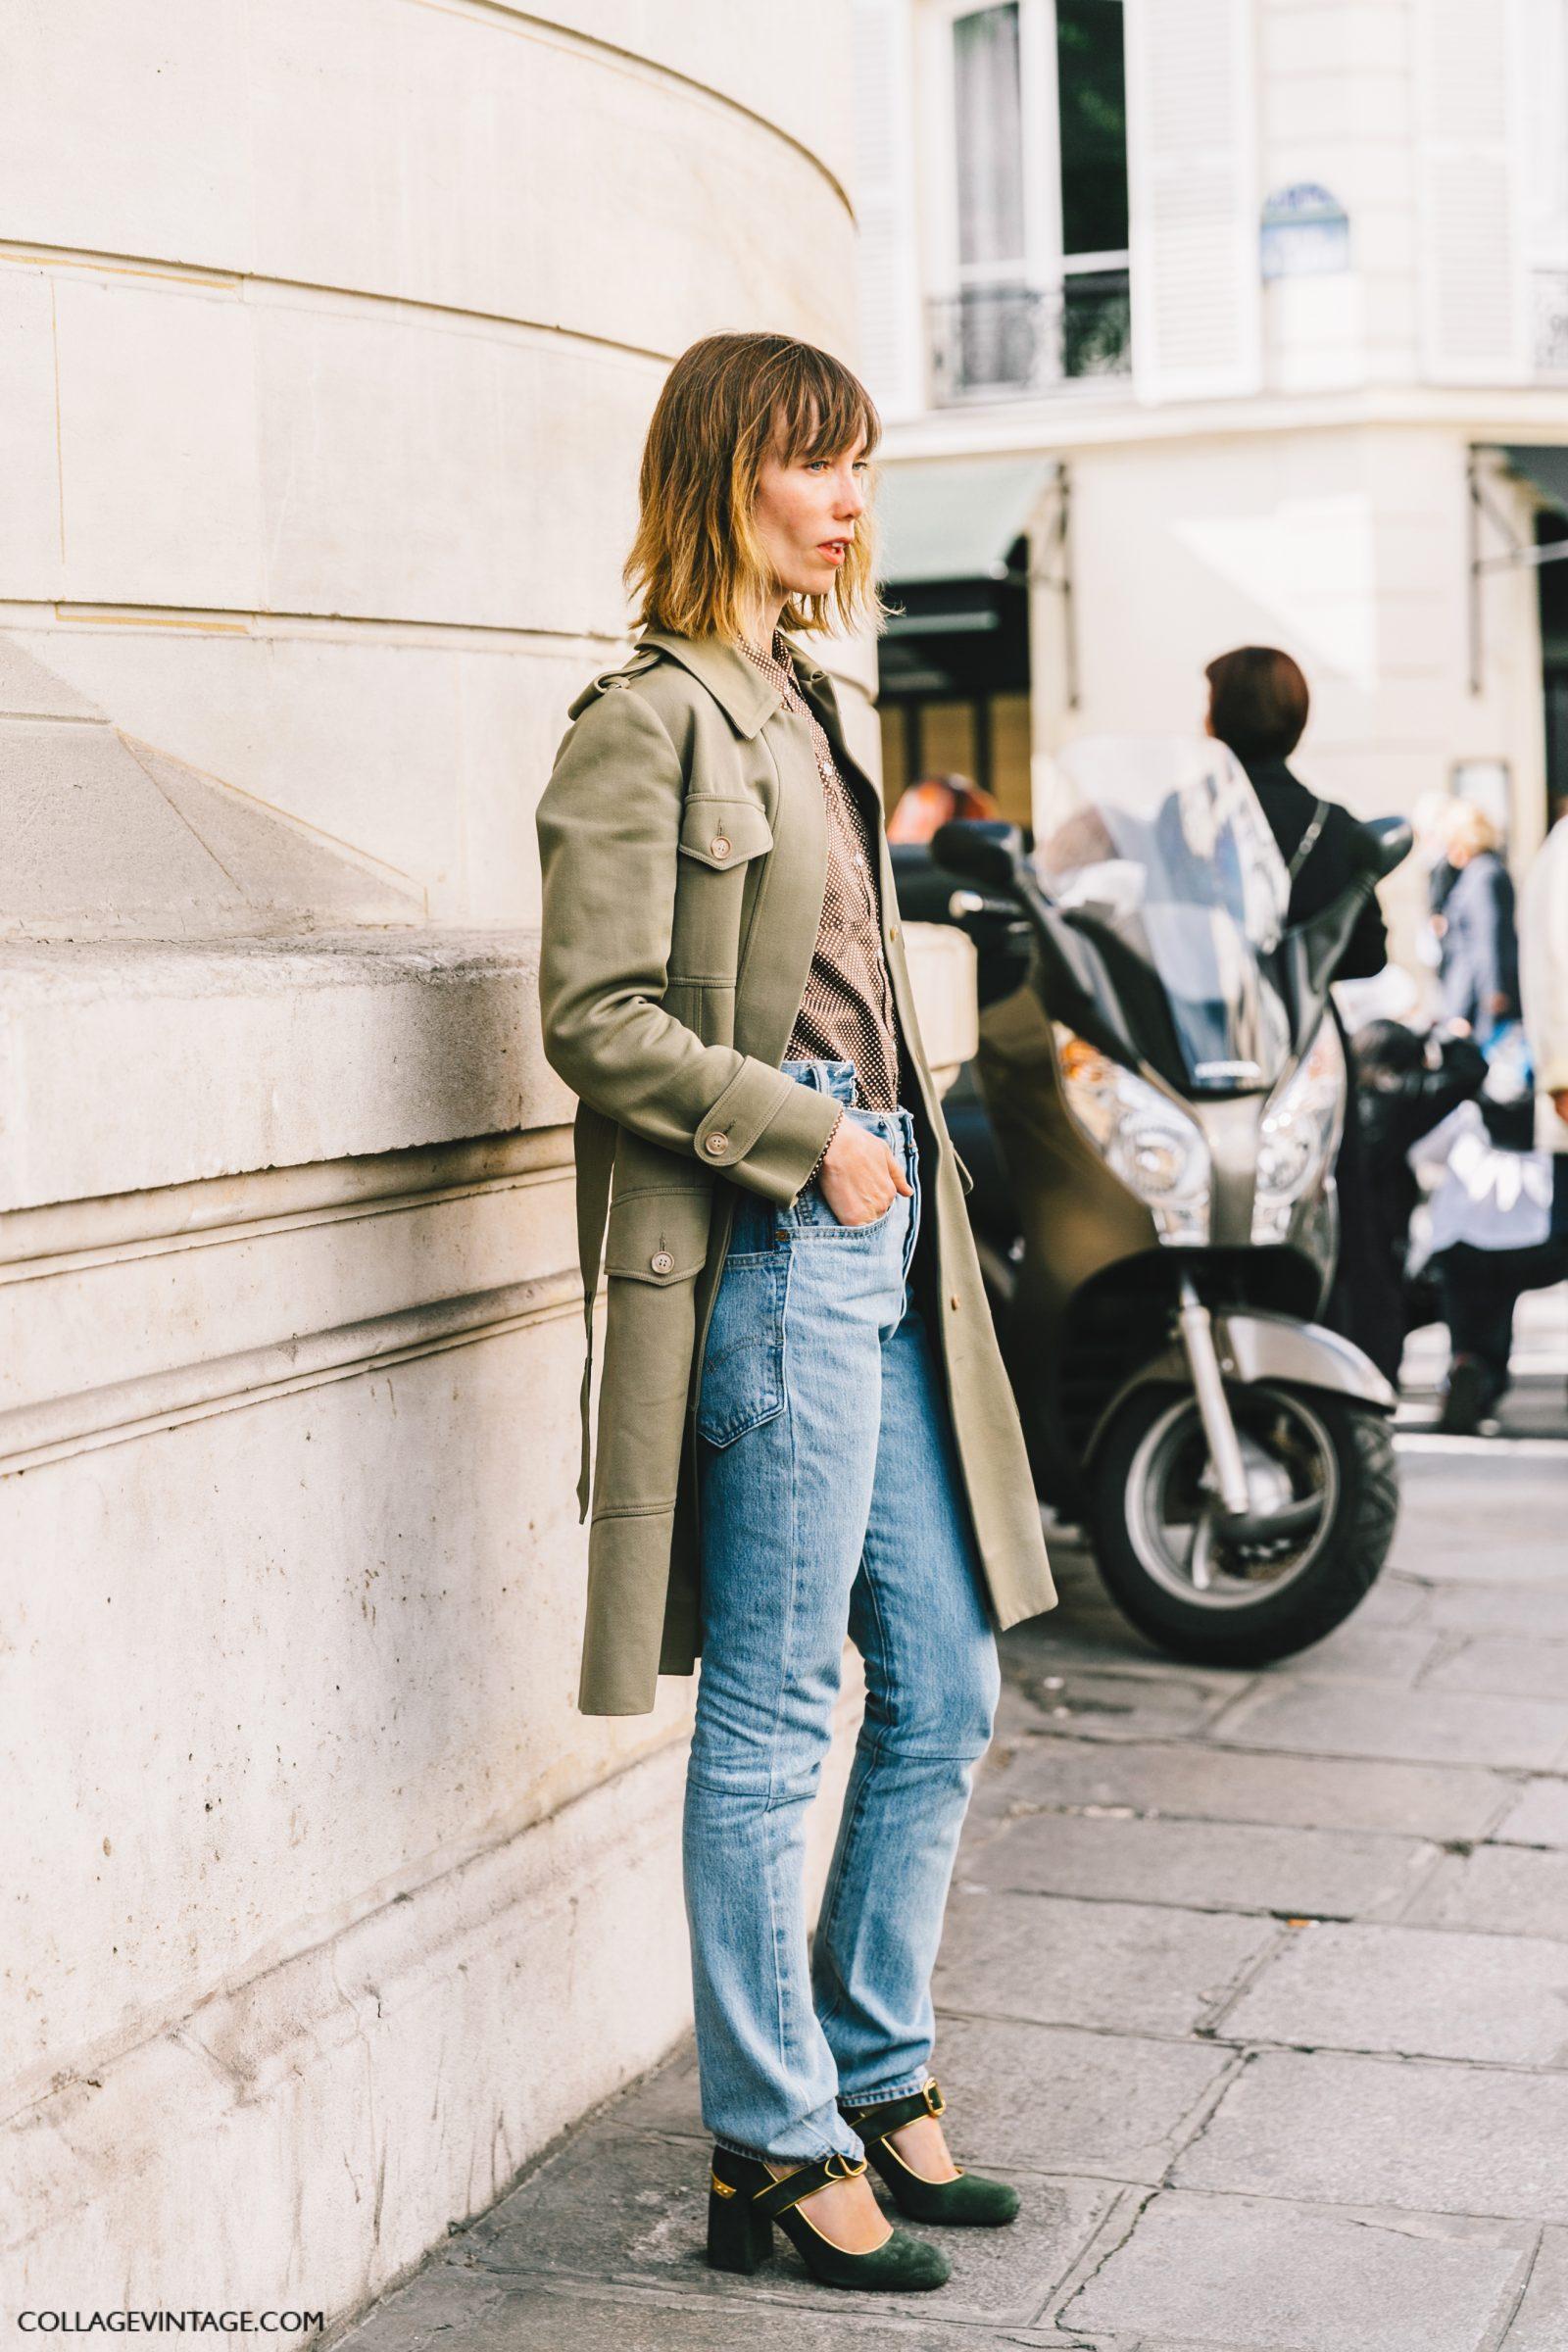 pfw-paris_fashion_week_ss17-street_style-outfits-collage_vintage-valentino-balenciaga-celine-135